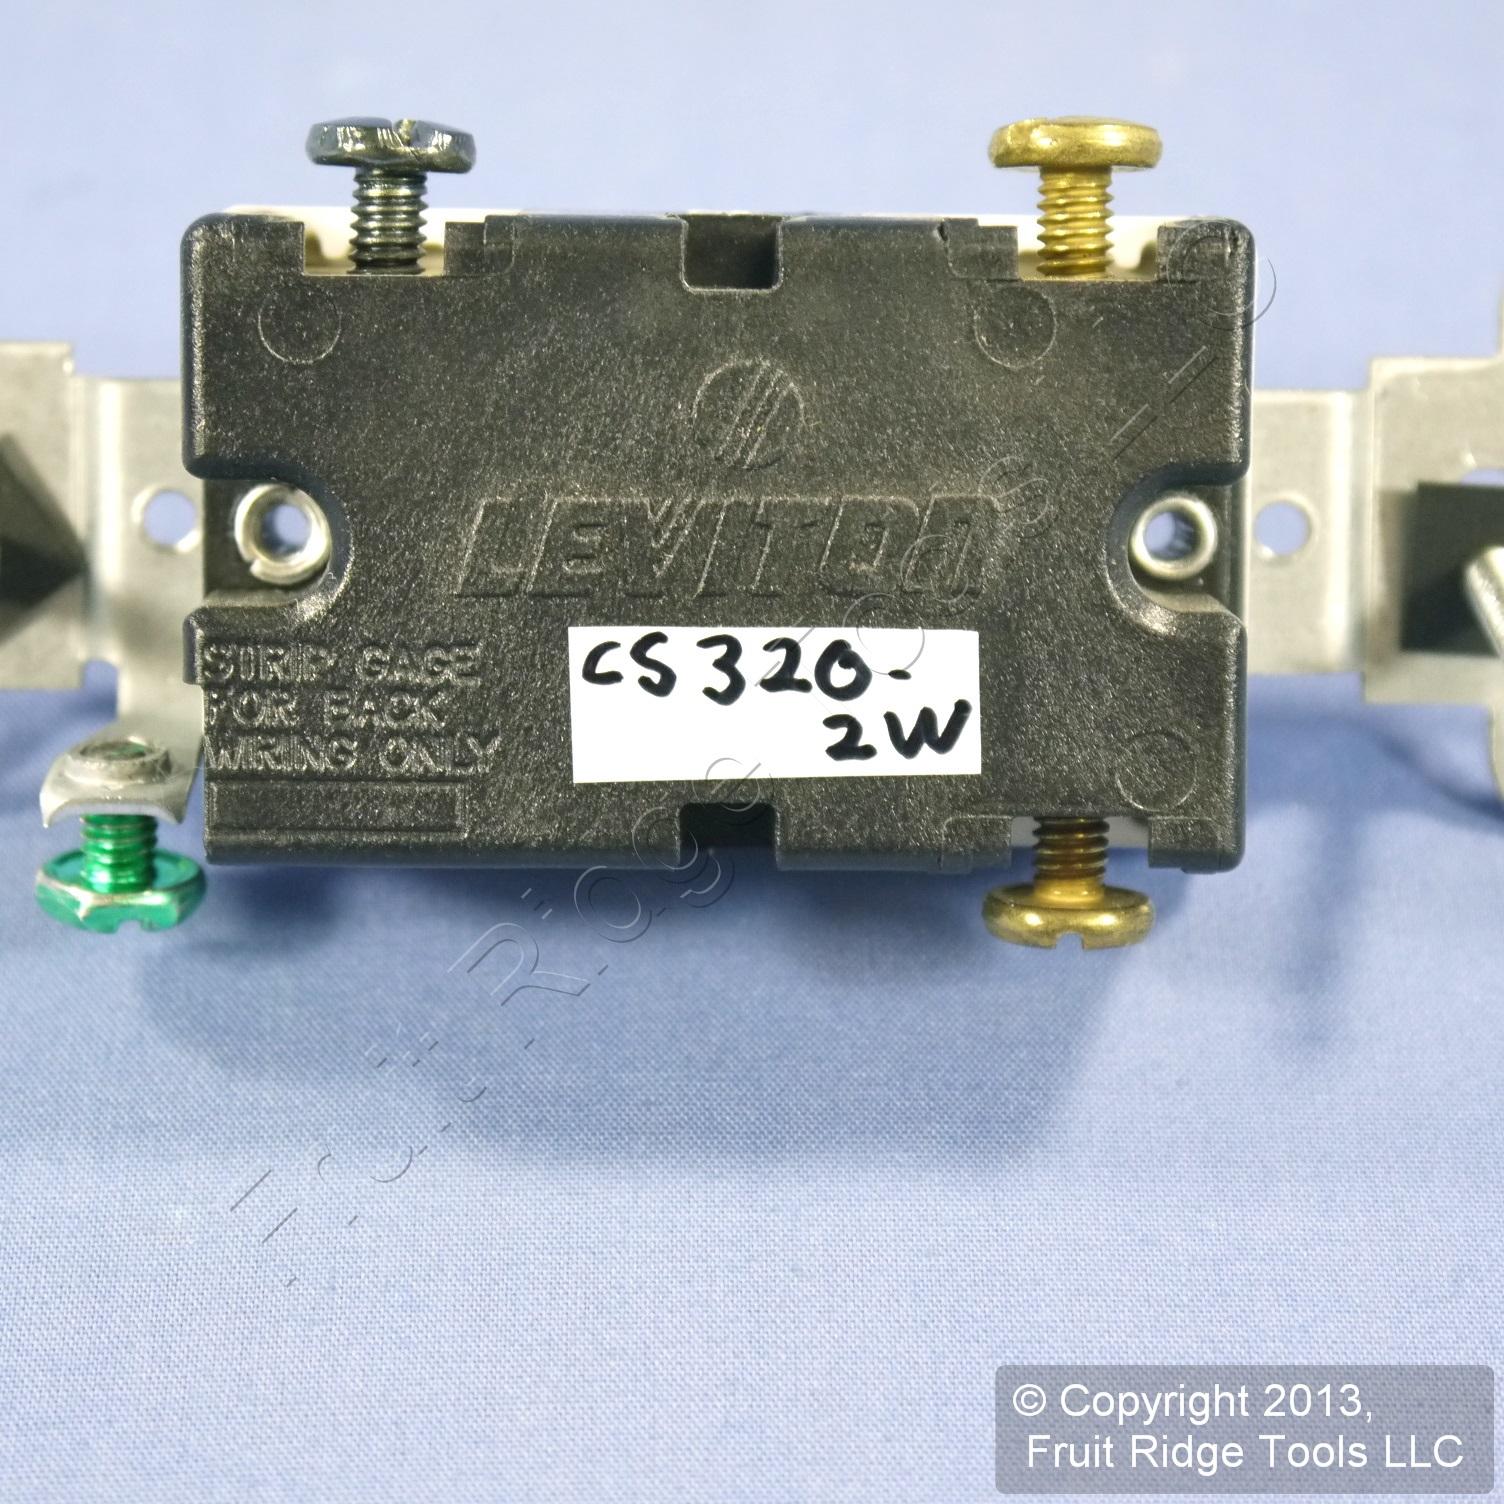 Leviton White 3-Way COMMERCIAL Grade Toggle Wall Light Switch 20A Bulk CS320-2W